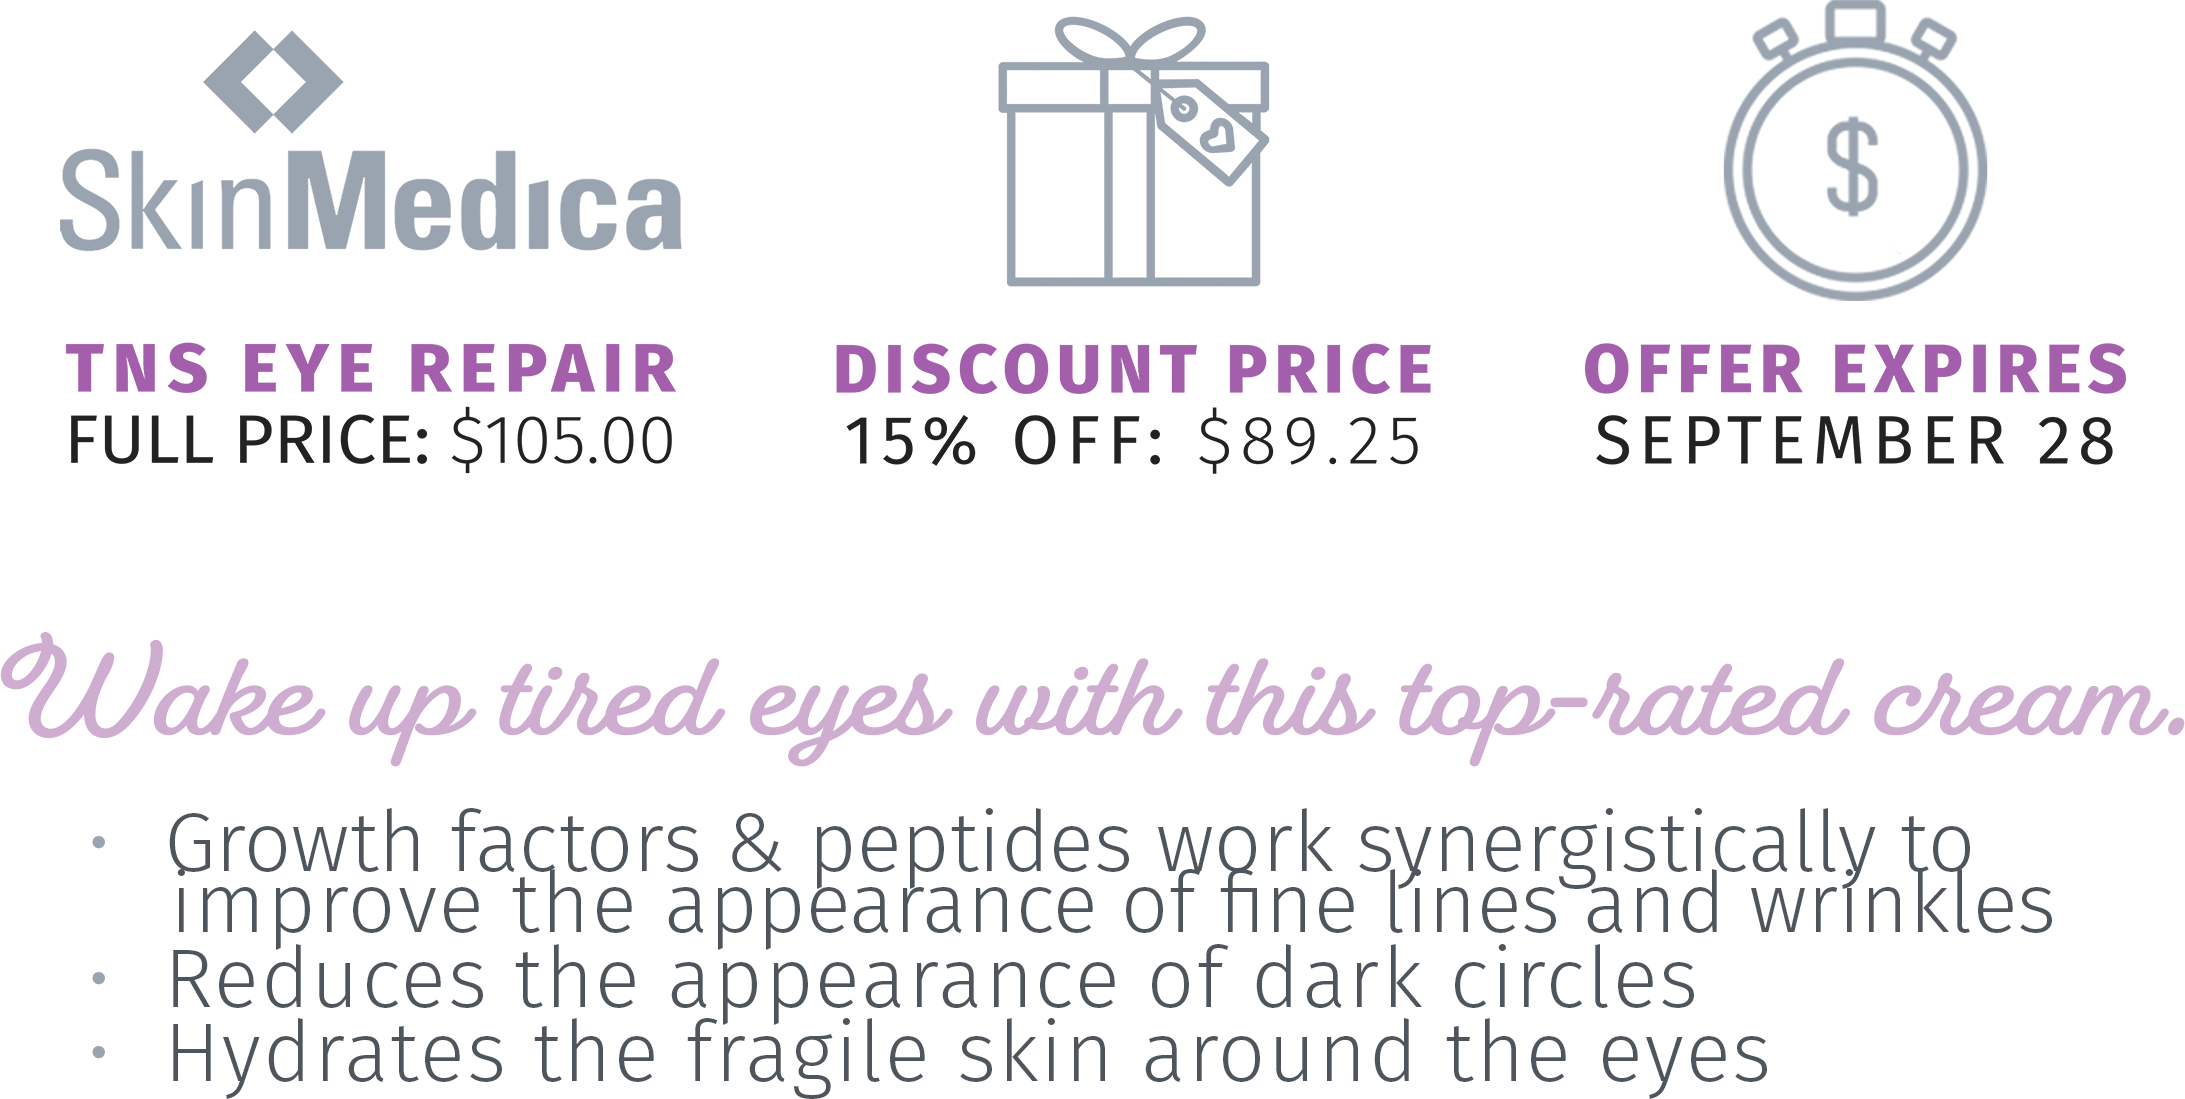 SkinMedica TNS Eye Repair (Overview) 2